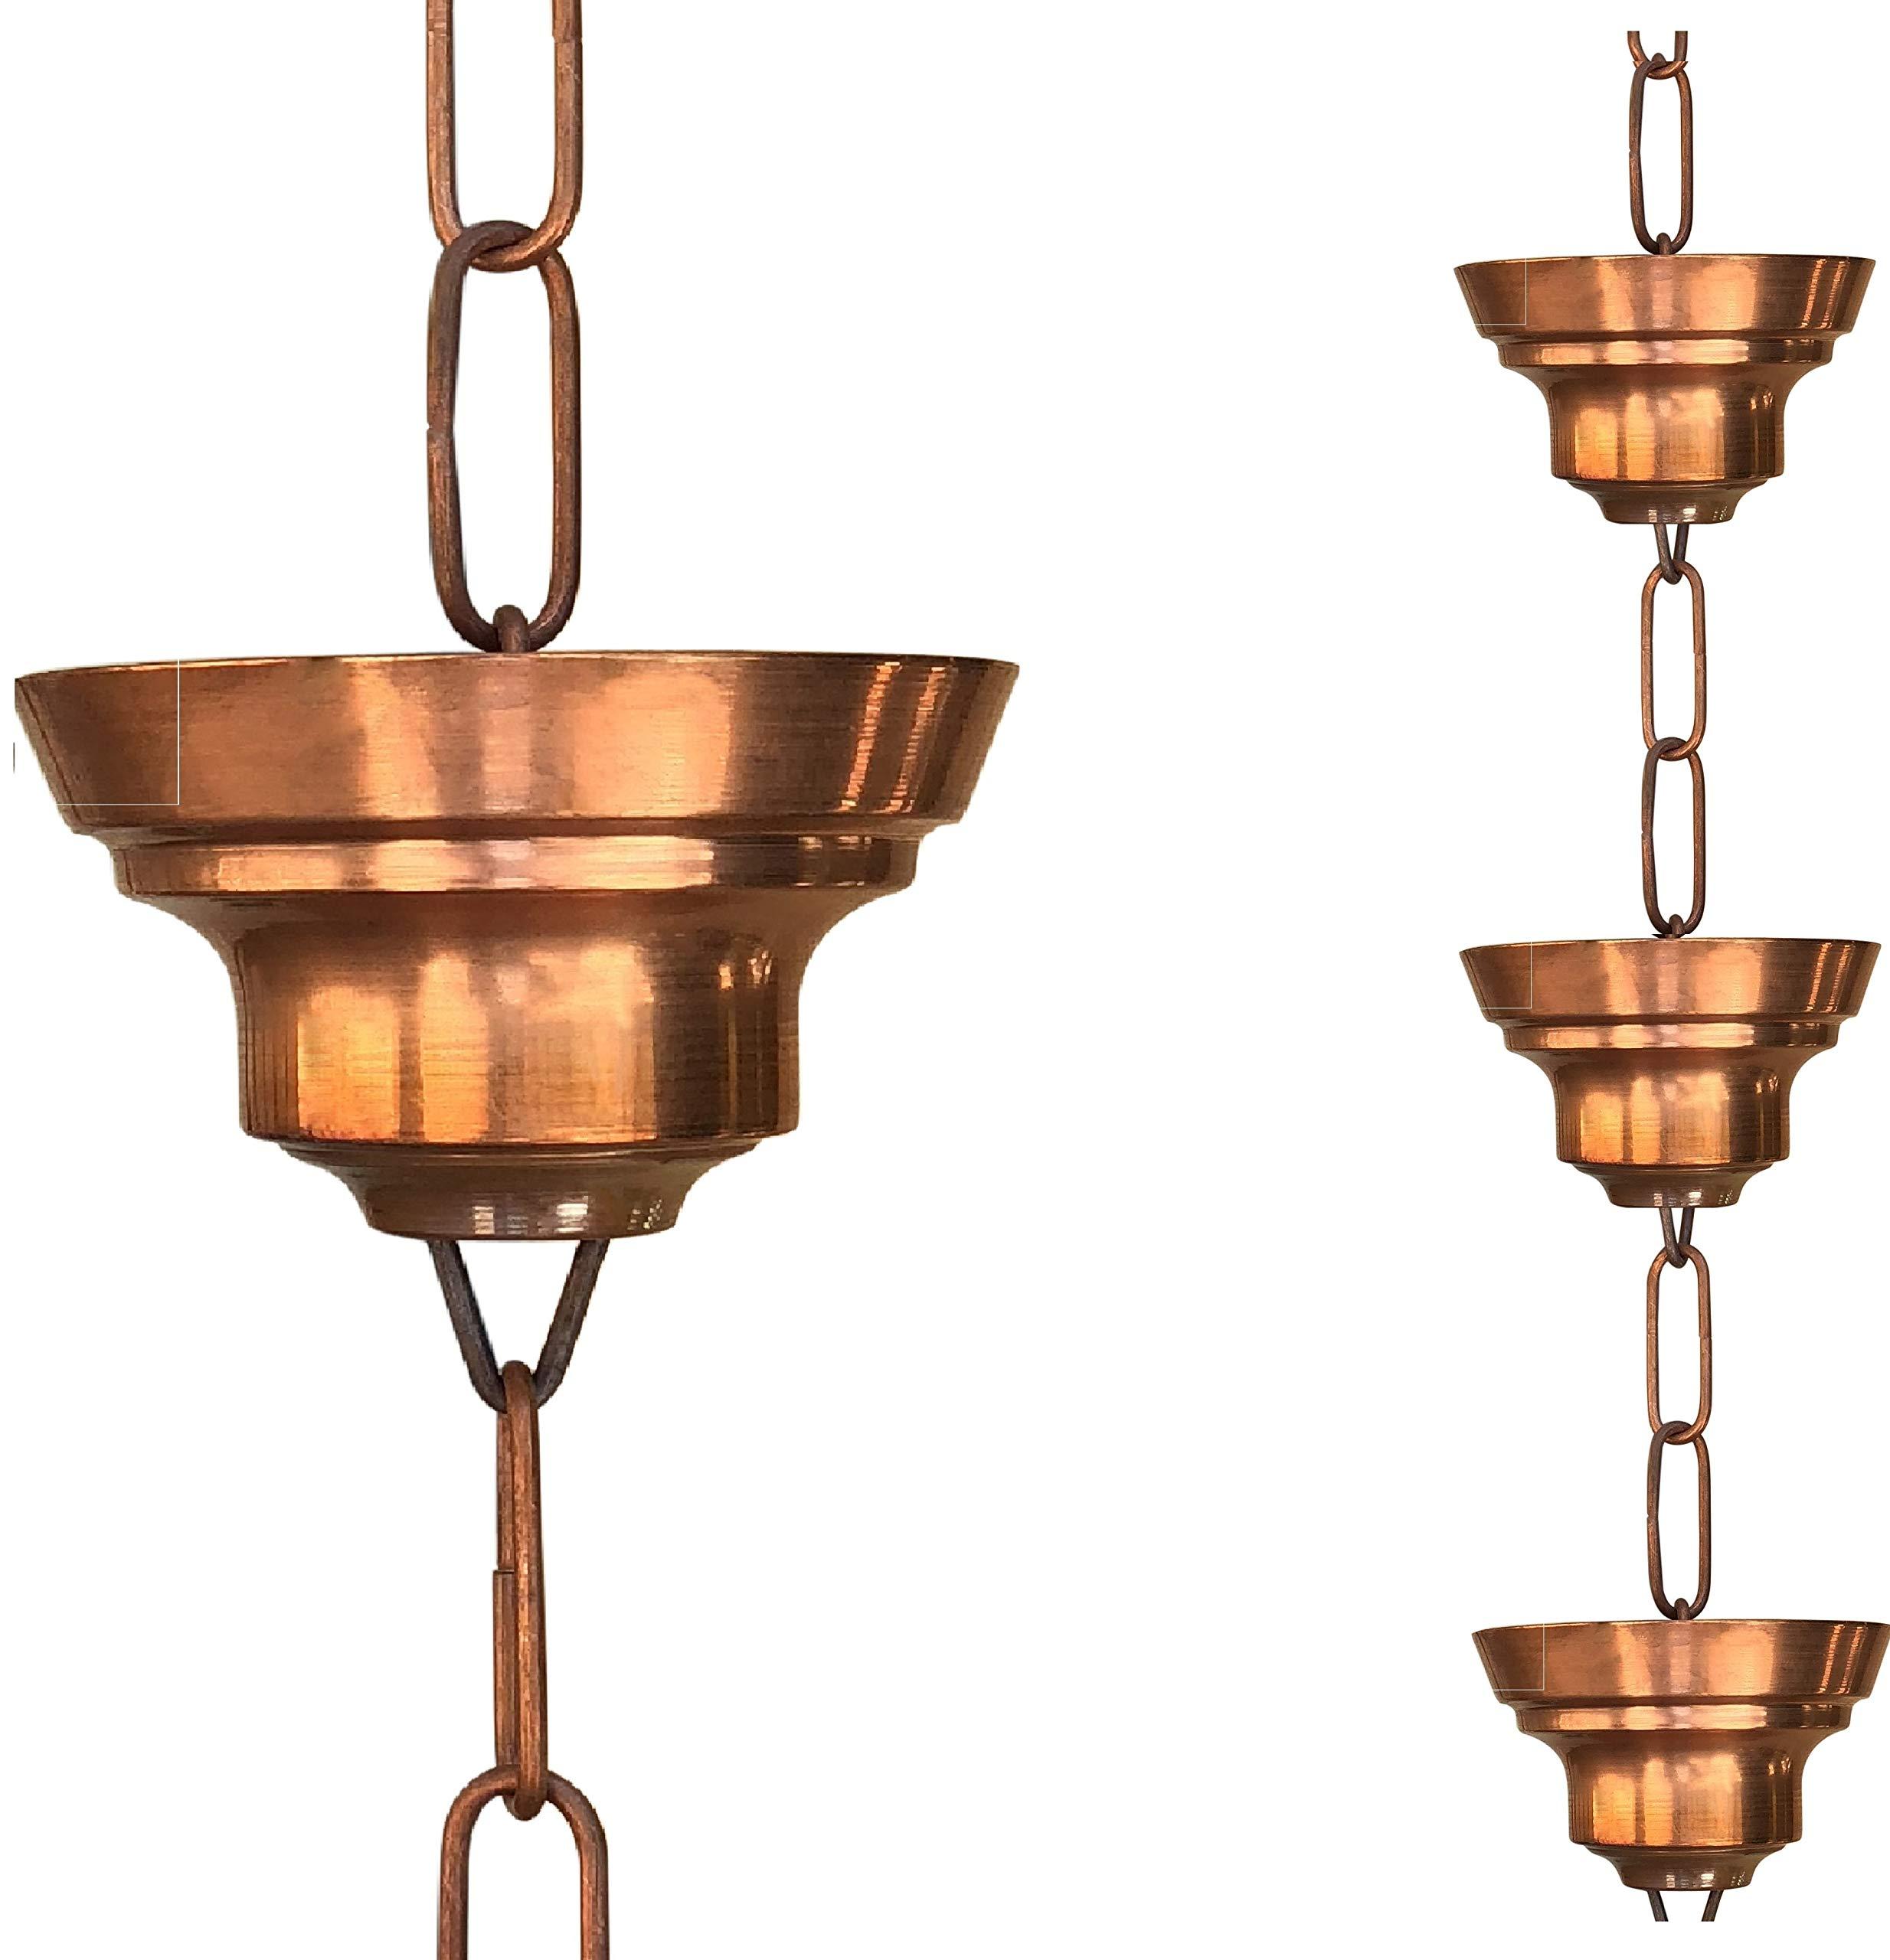 Monarch Pure Copper Tranquility Link Rain Chain, 8-1/2-Feet Length